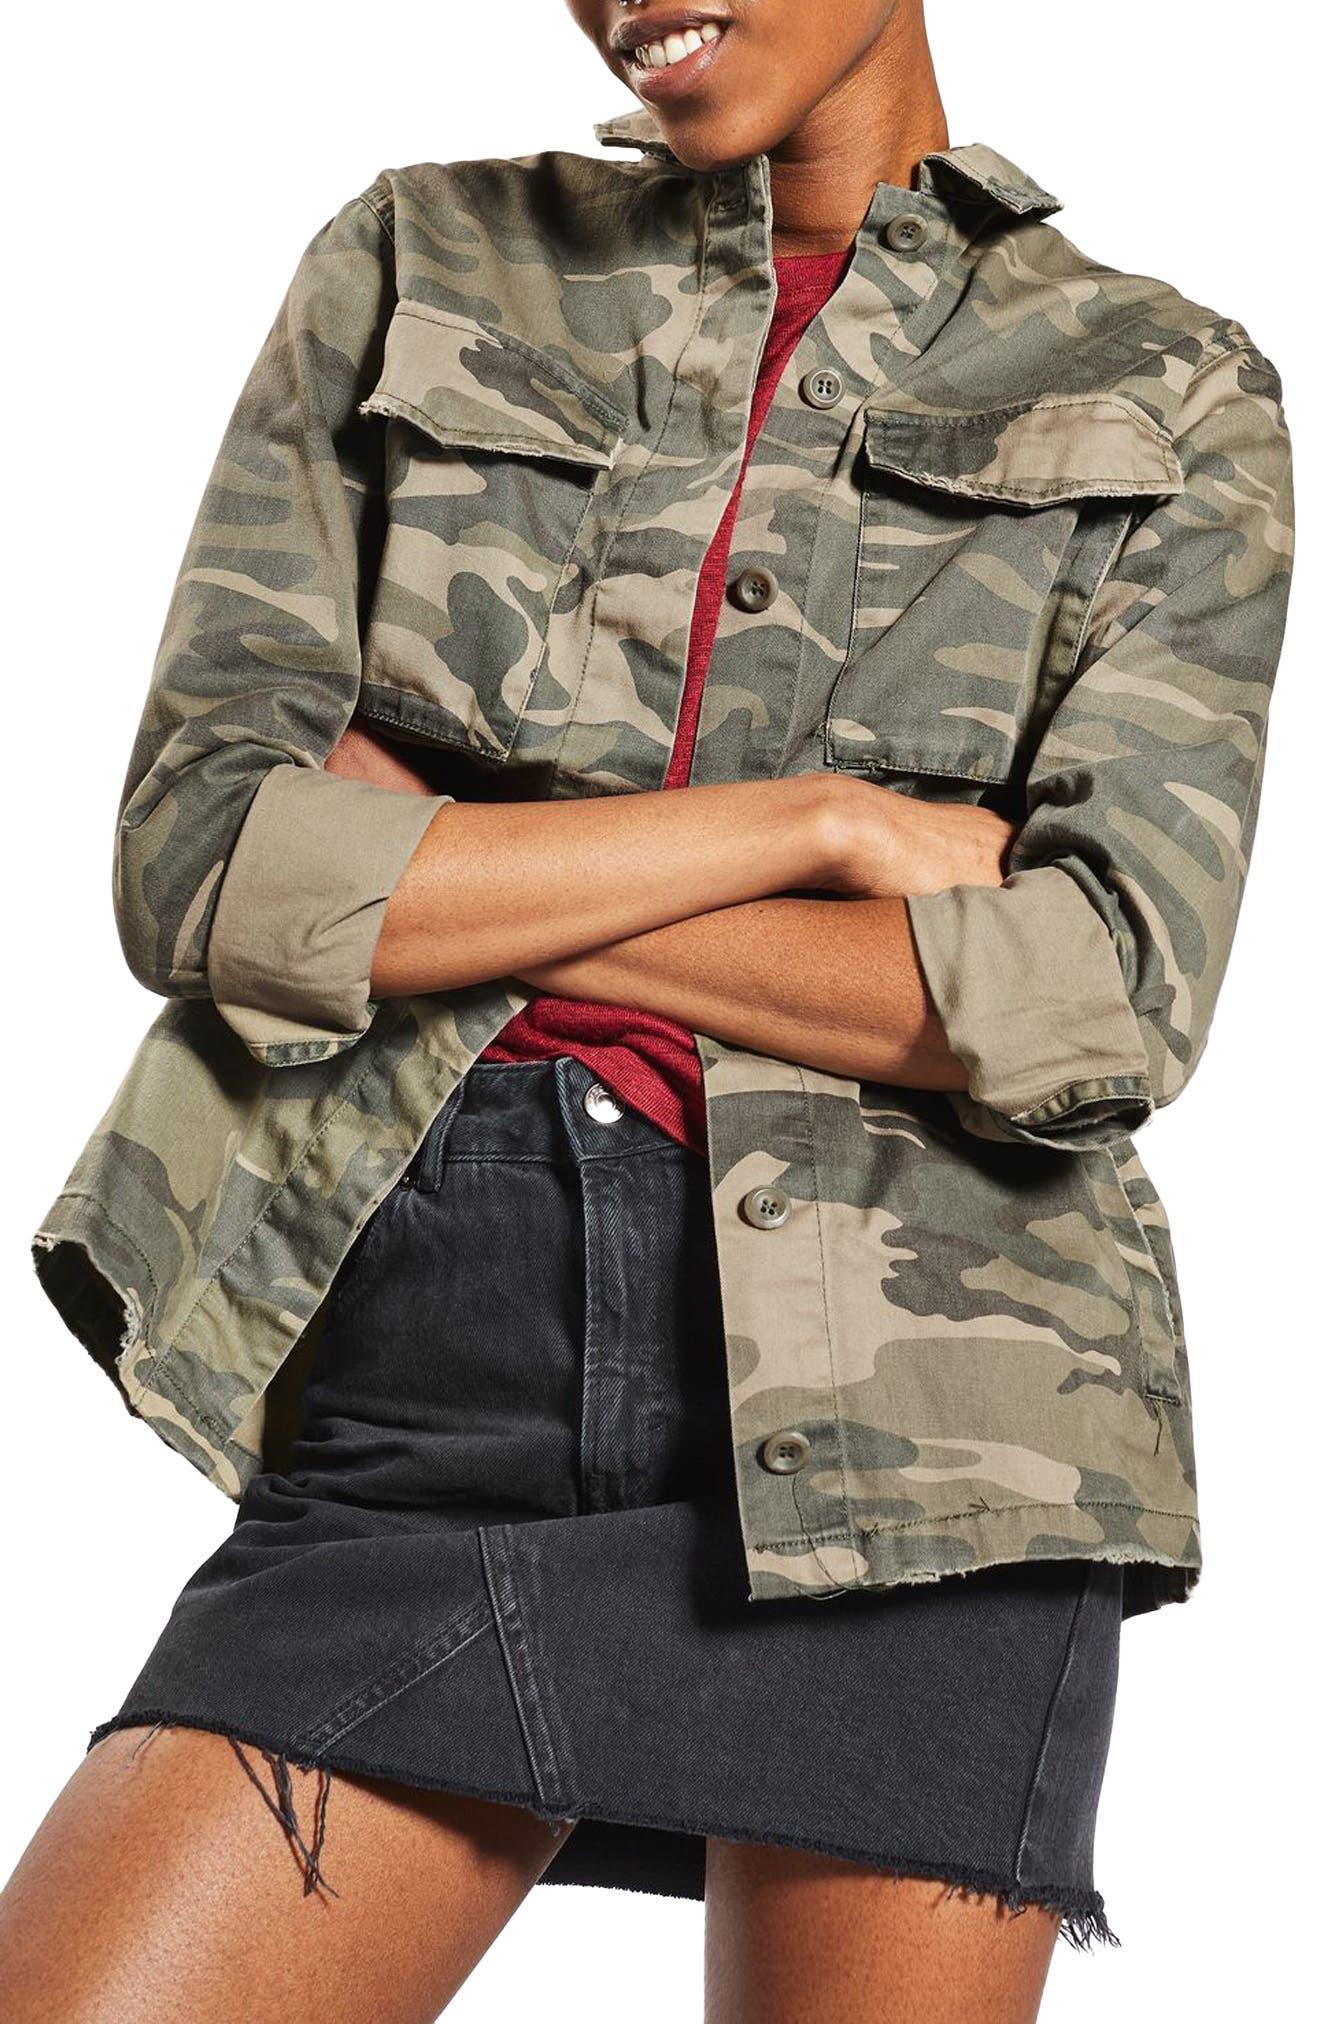 TOPSHOP, Sampson Camo Shirt Jacket, Main thumbnail 1, color, 300